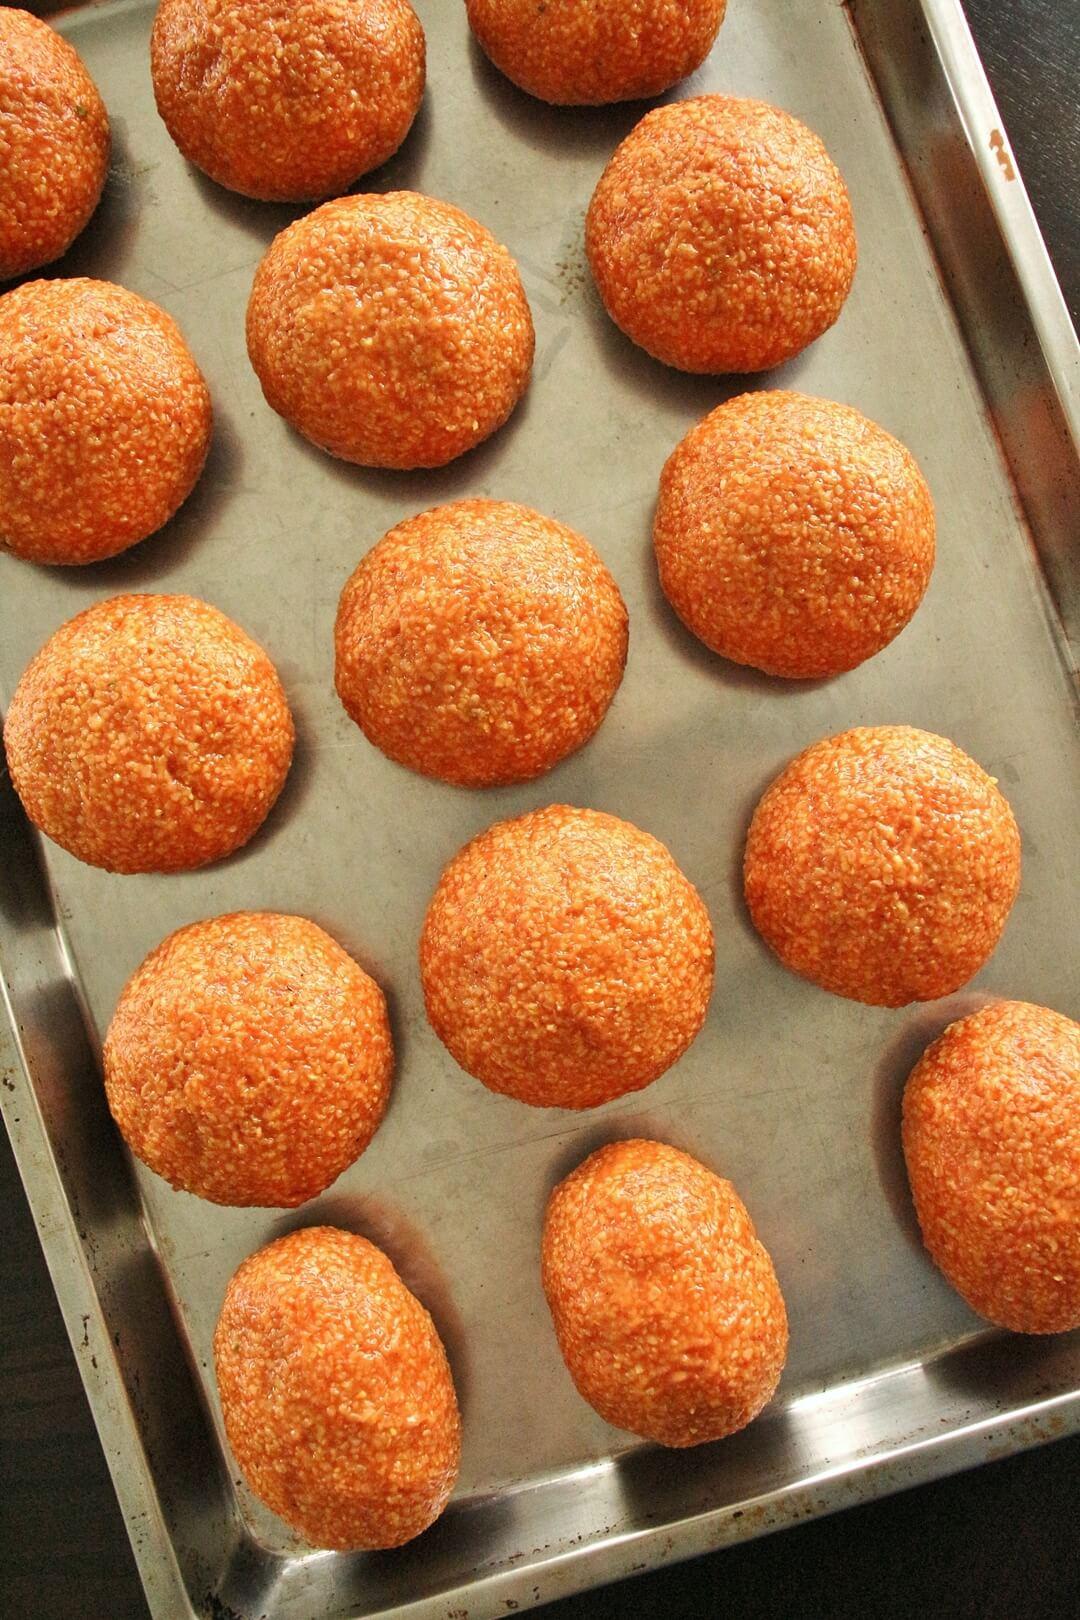 A tray of round ishli koftes with a few oval-shaped koftes